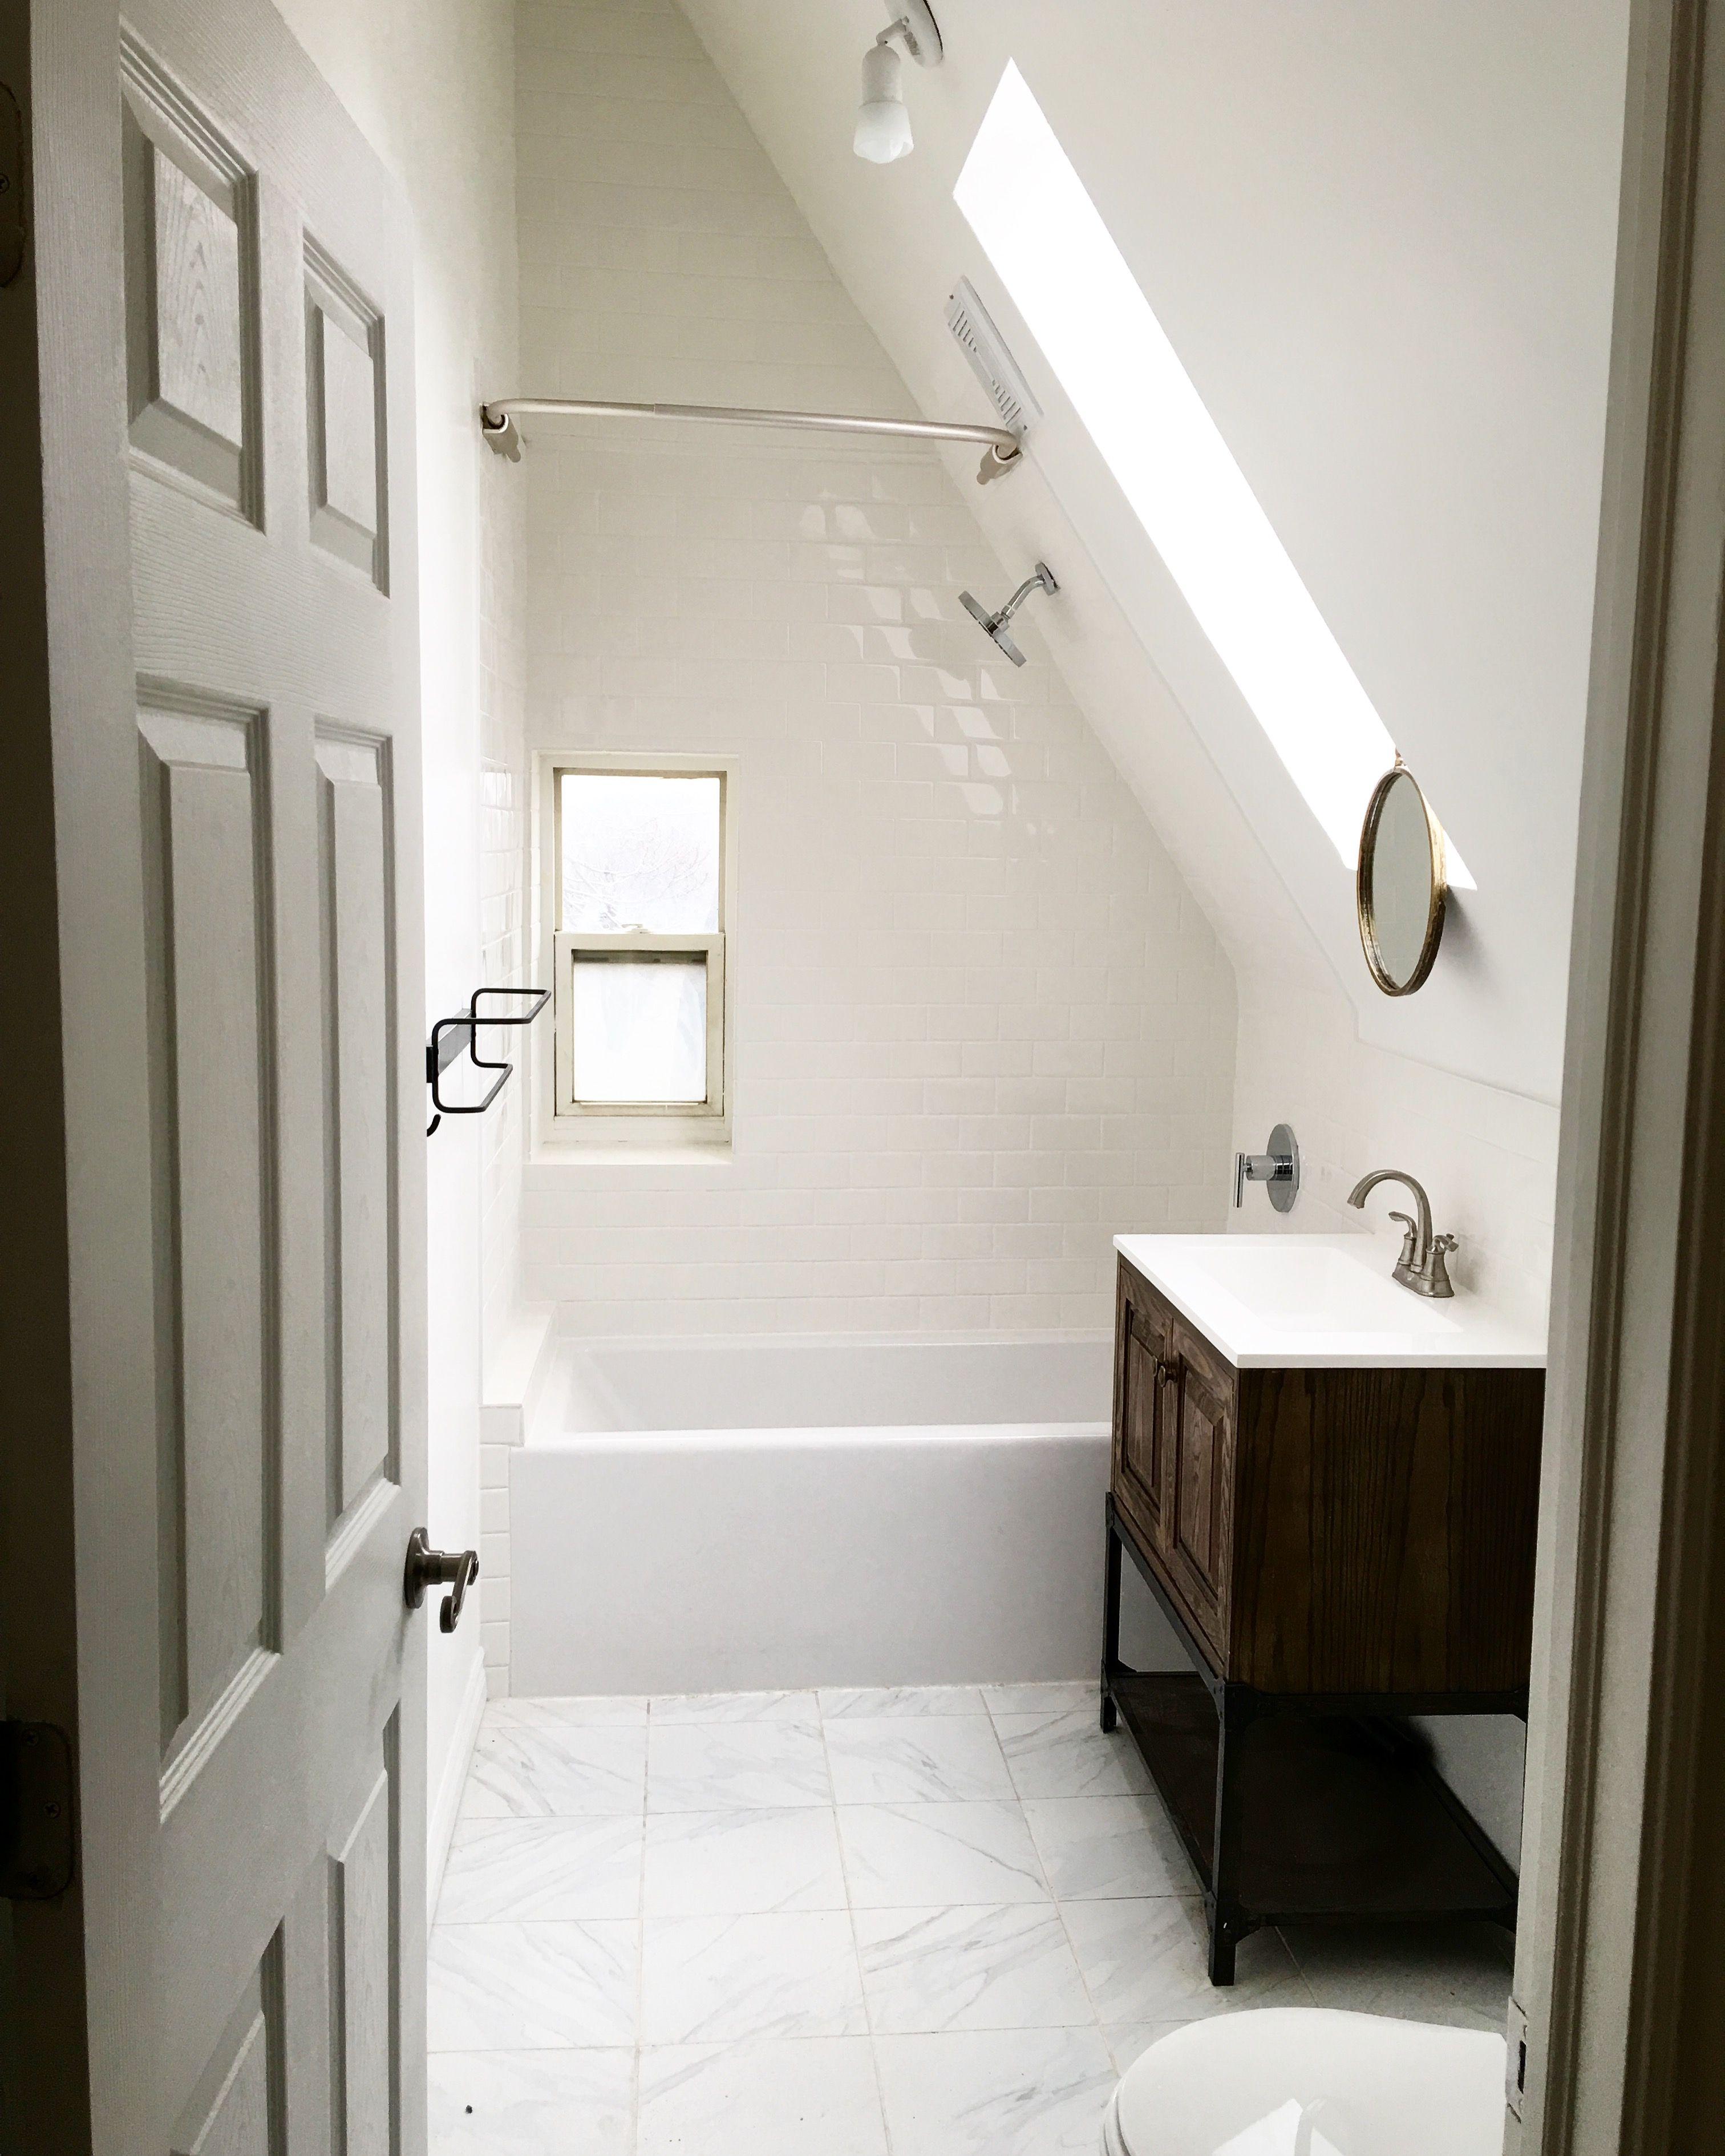 Attic bathroom inspired by Pinterest.   Bathroom   Pinterest   Attic ...